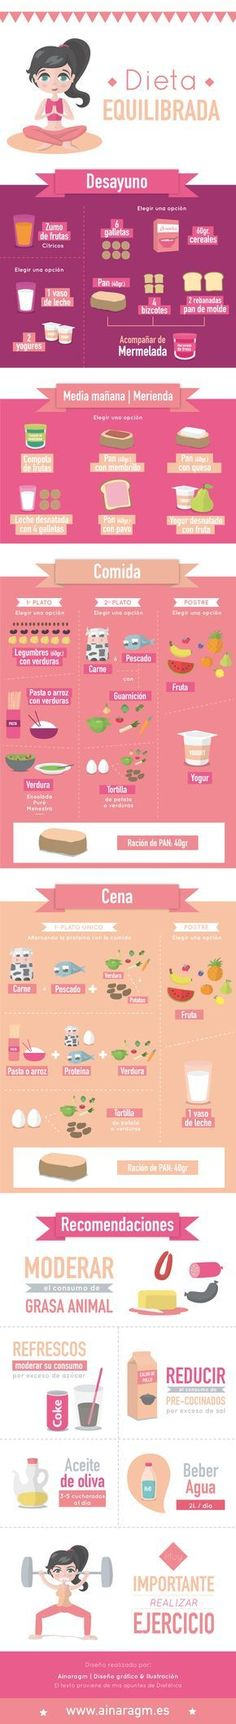 infografia una dieta equilibrada